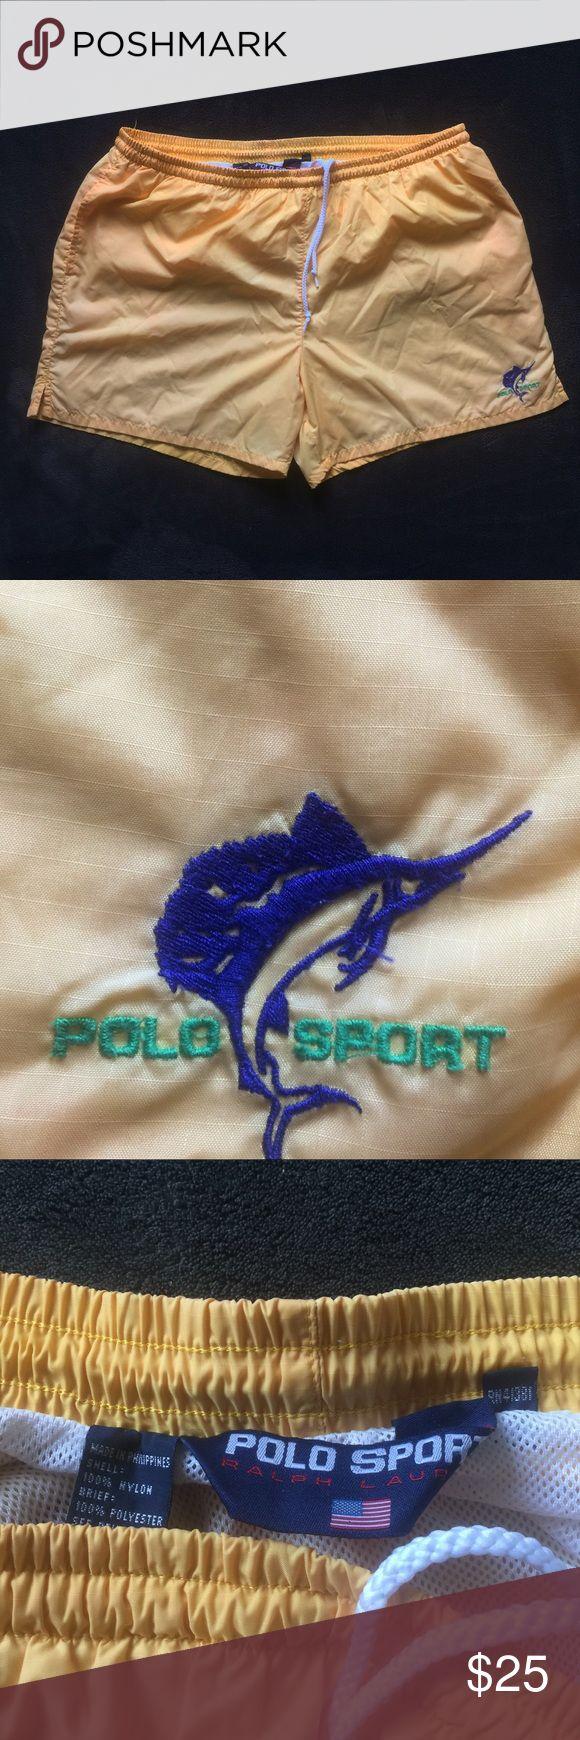 Polo Sport Ralph Lauren Swim Shorts XL New Dead Stock pet free smoke free great look Polo by Ralph Lauren Shorts Athletic